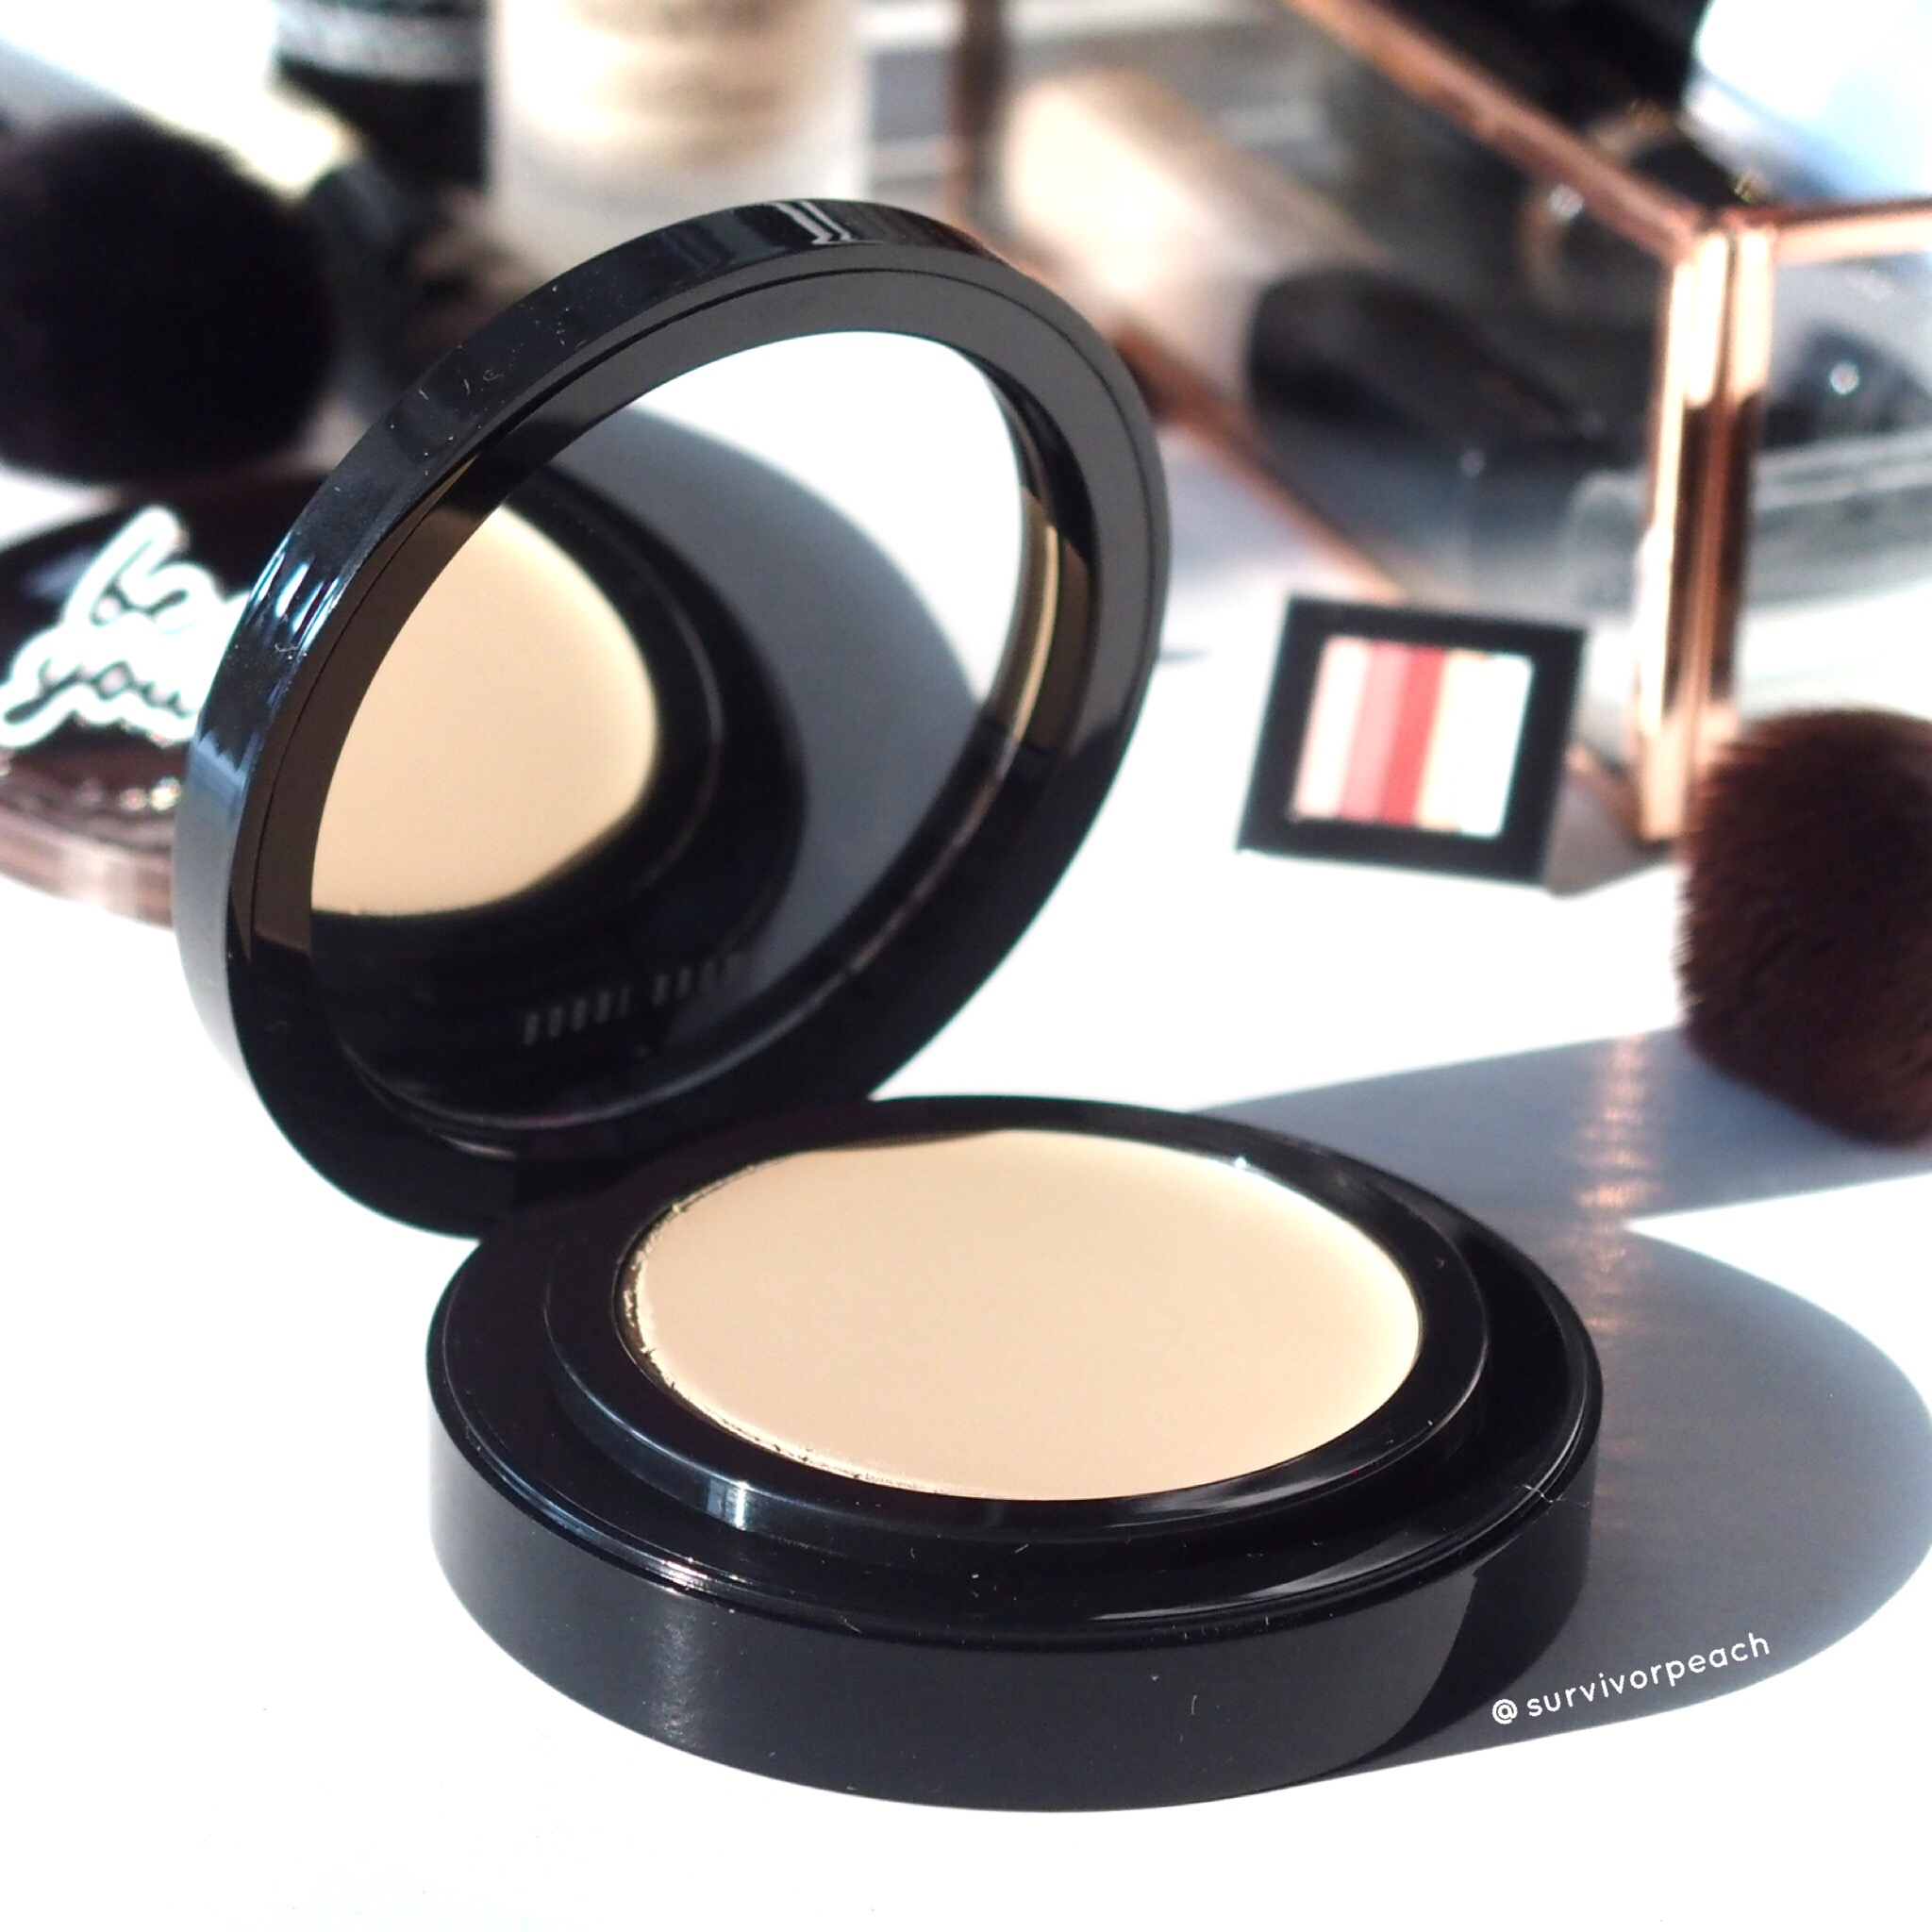 Bobbi Brown Skin Long Wear Weightless Compact Foundation SPF 30+++